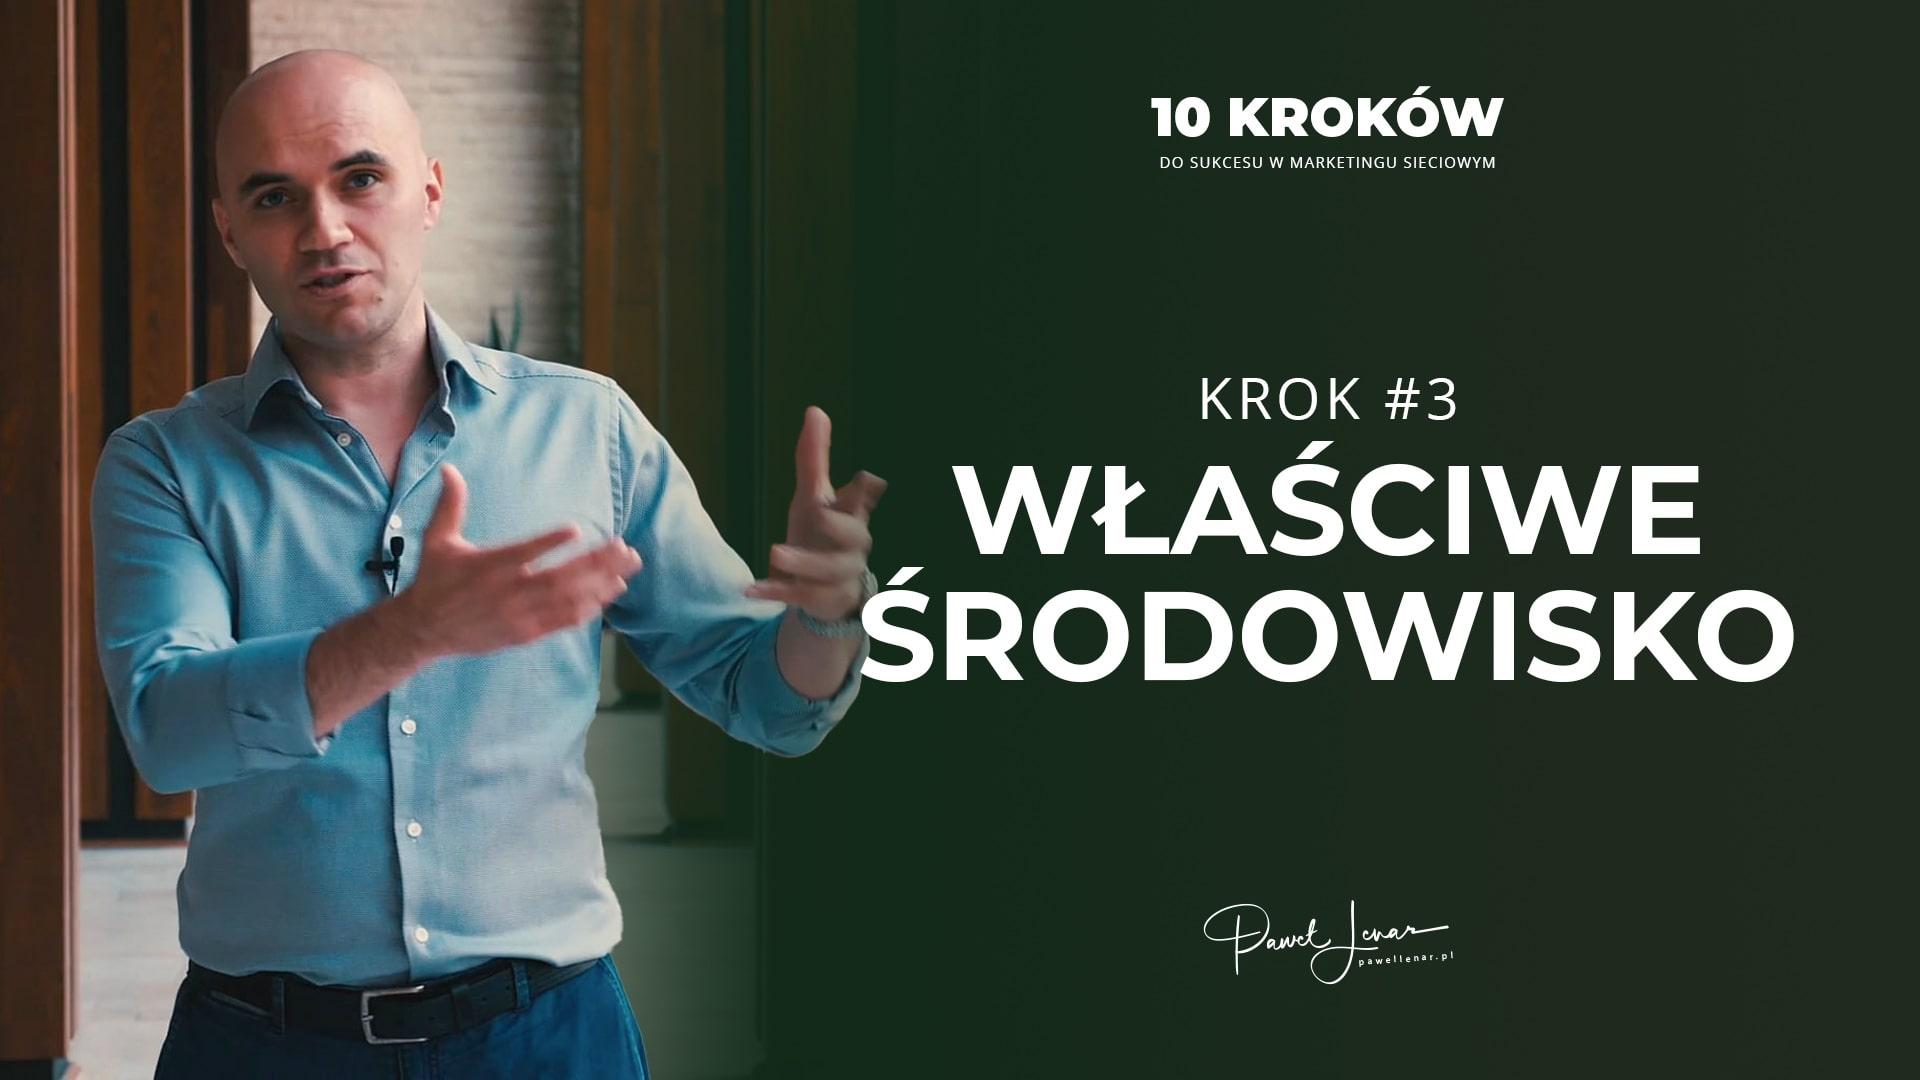 03 wlasciwe srodowisko - Paweł Lenar Blog